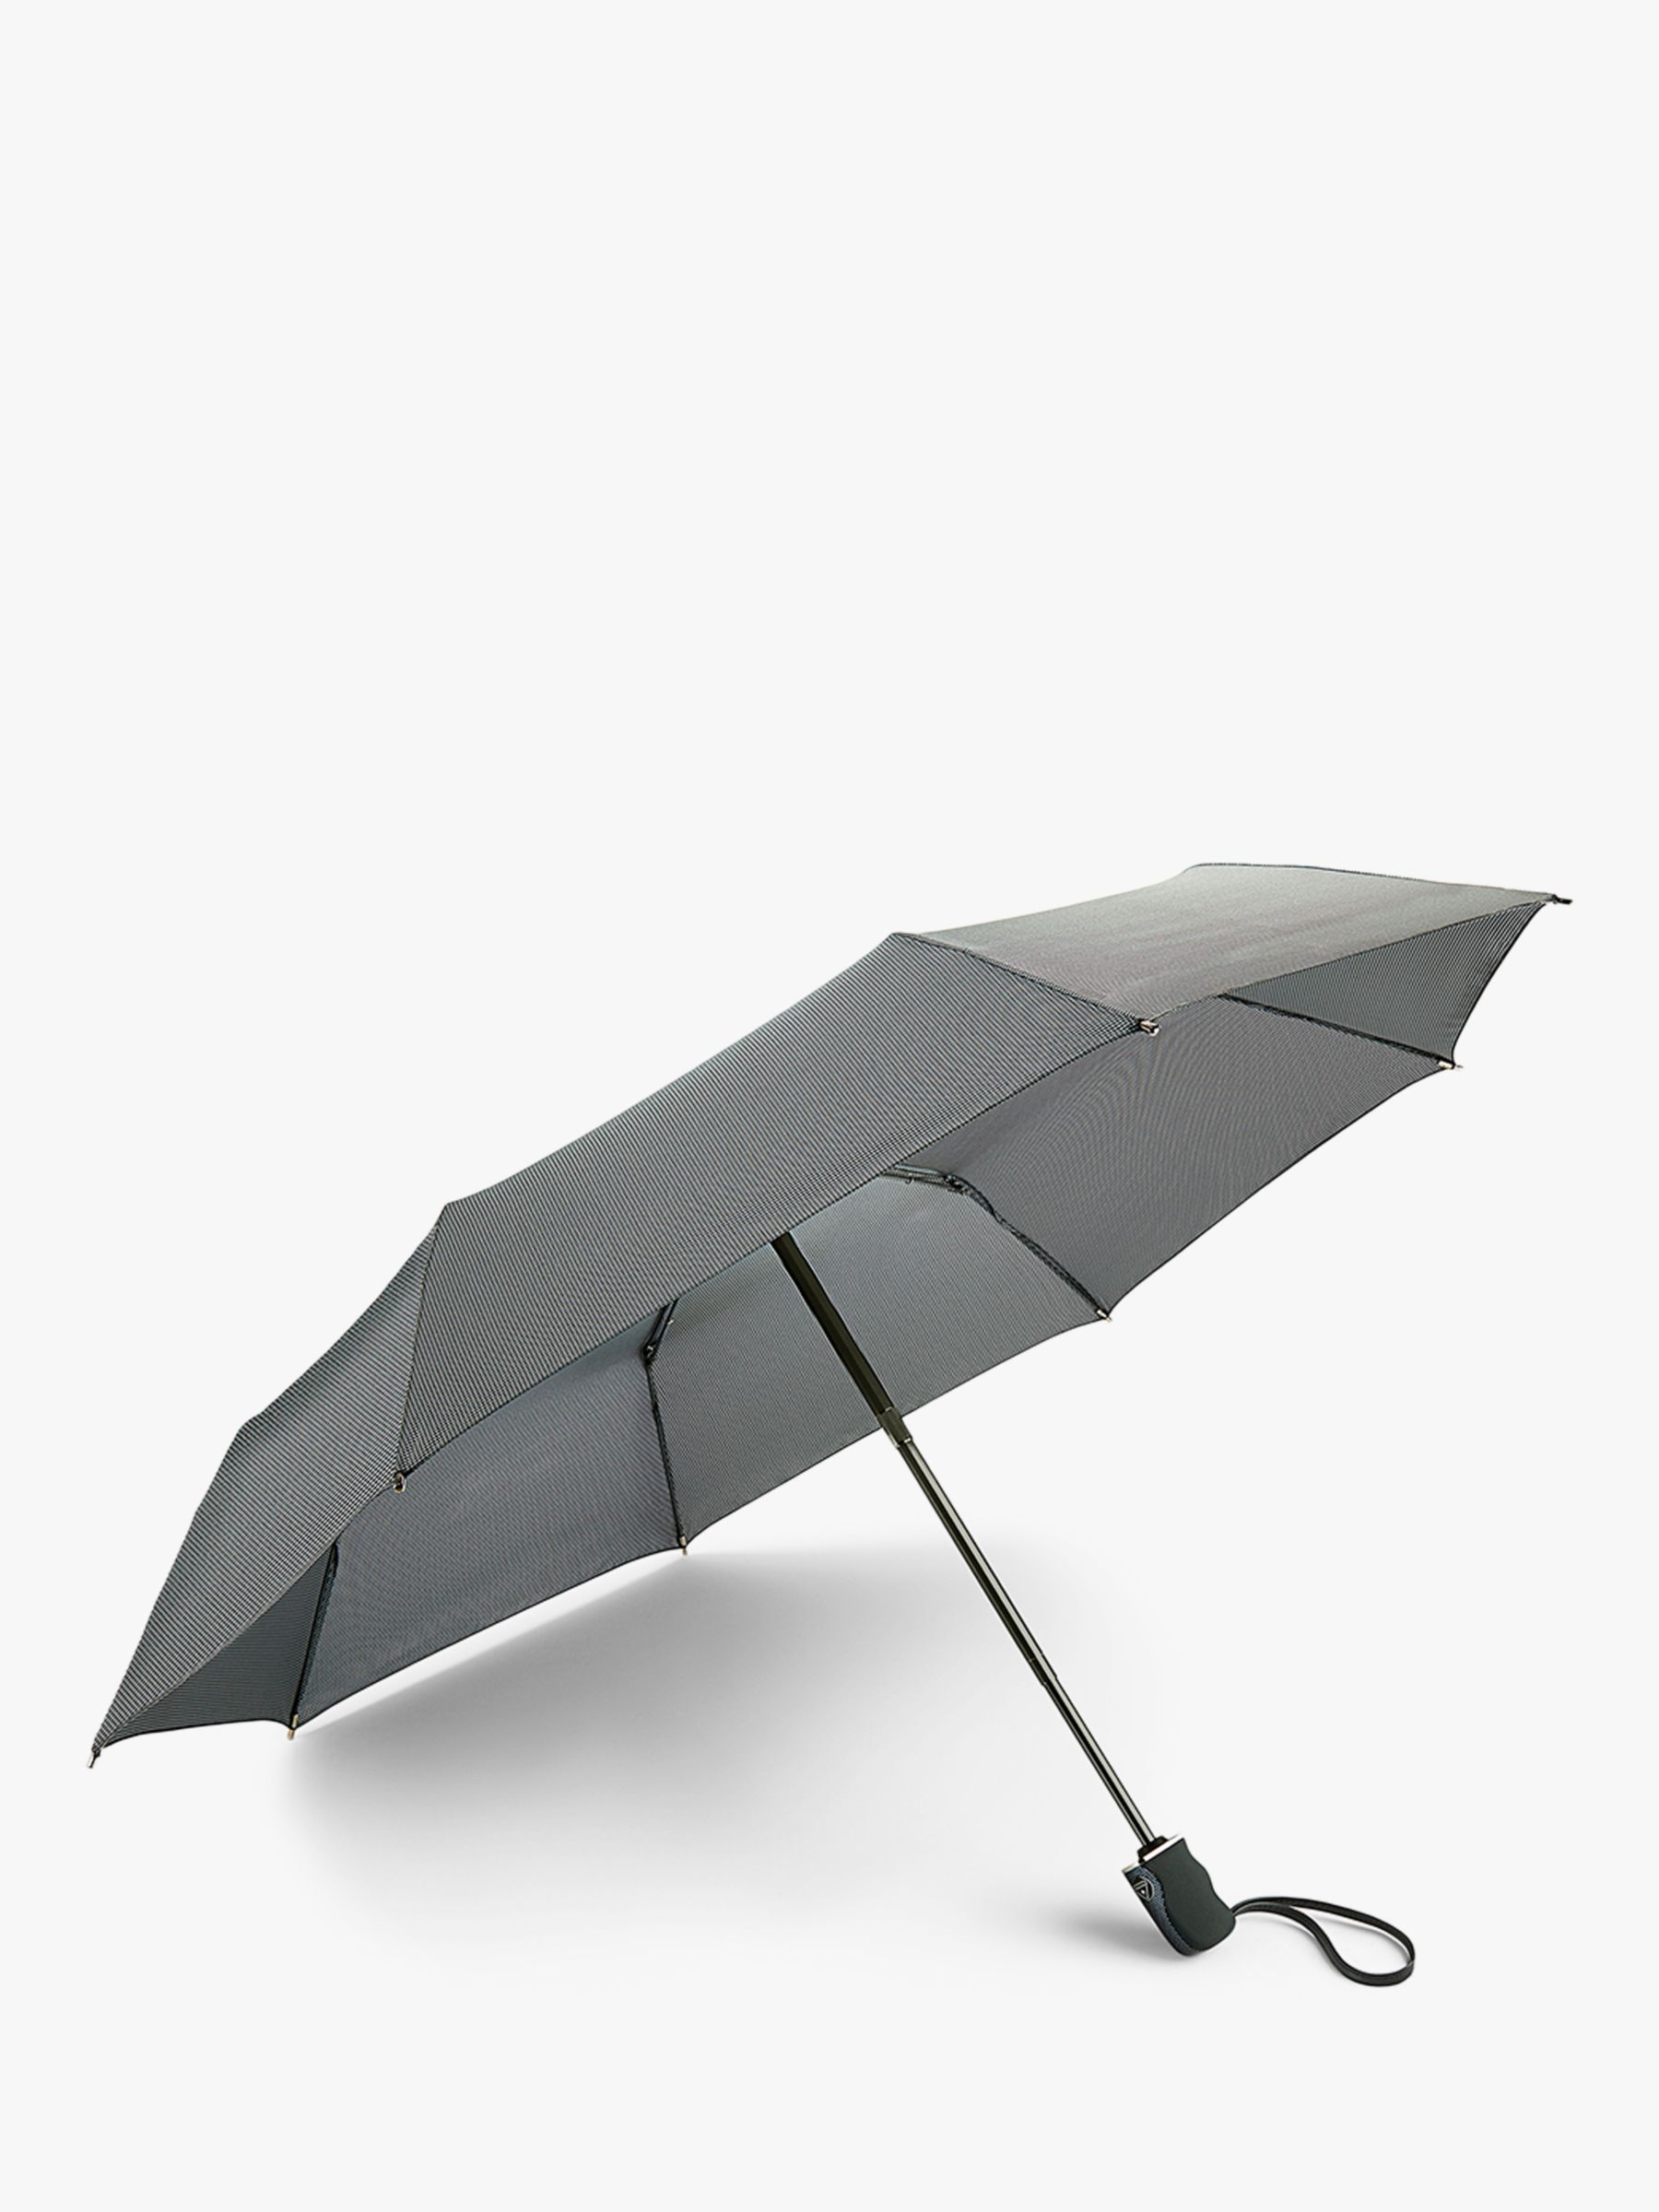 Fulton Fulton Houndstooth Telescopic Umbrella, Grey